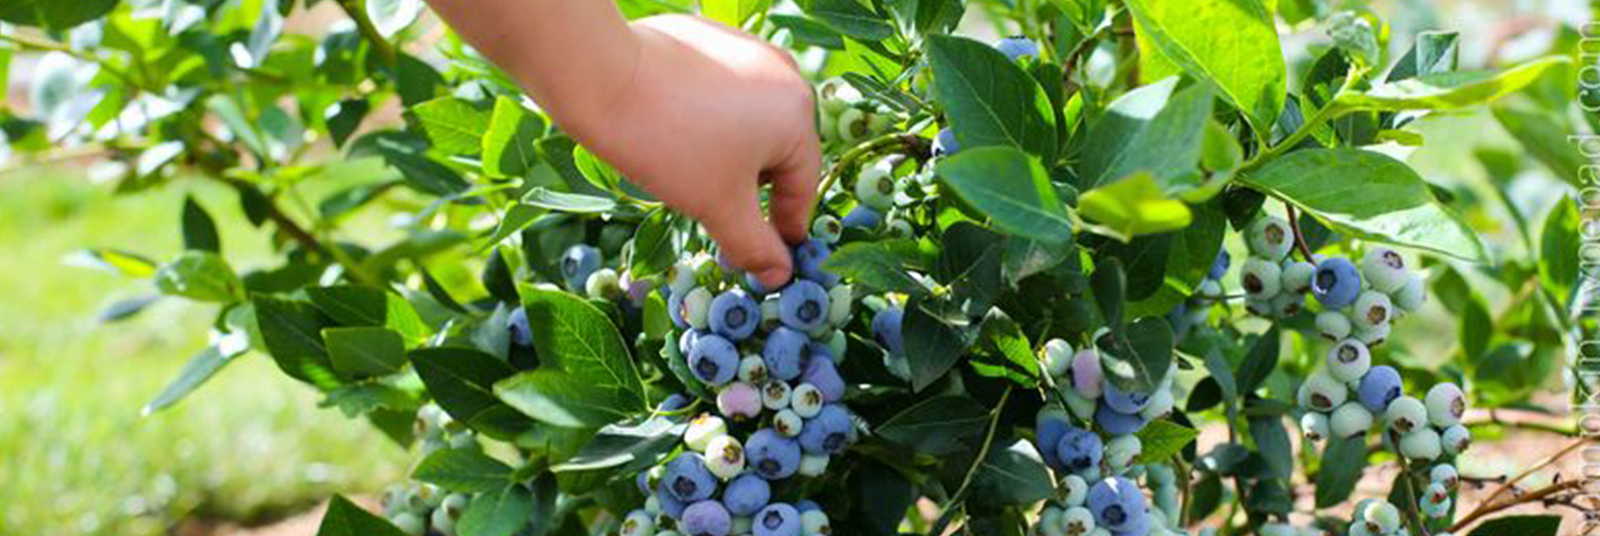 blueberries-tallahassee